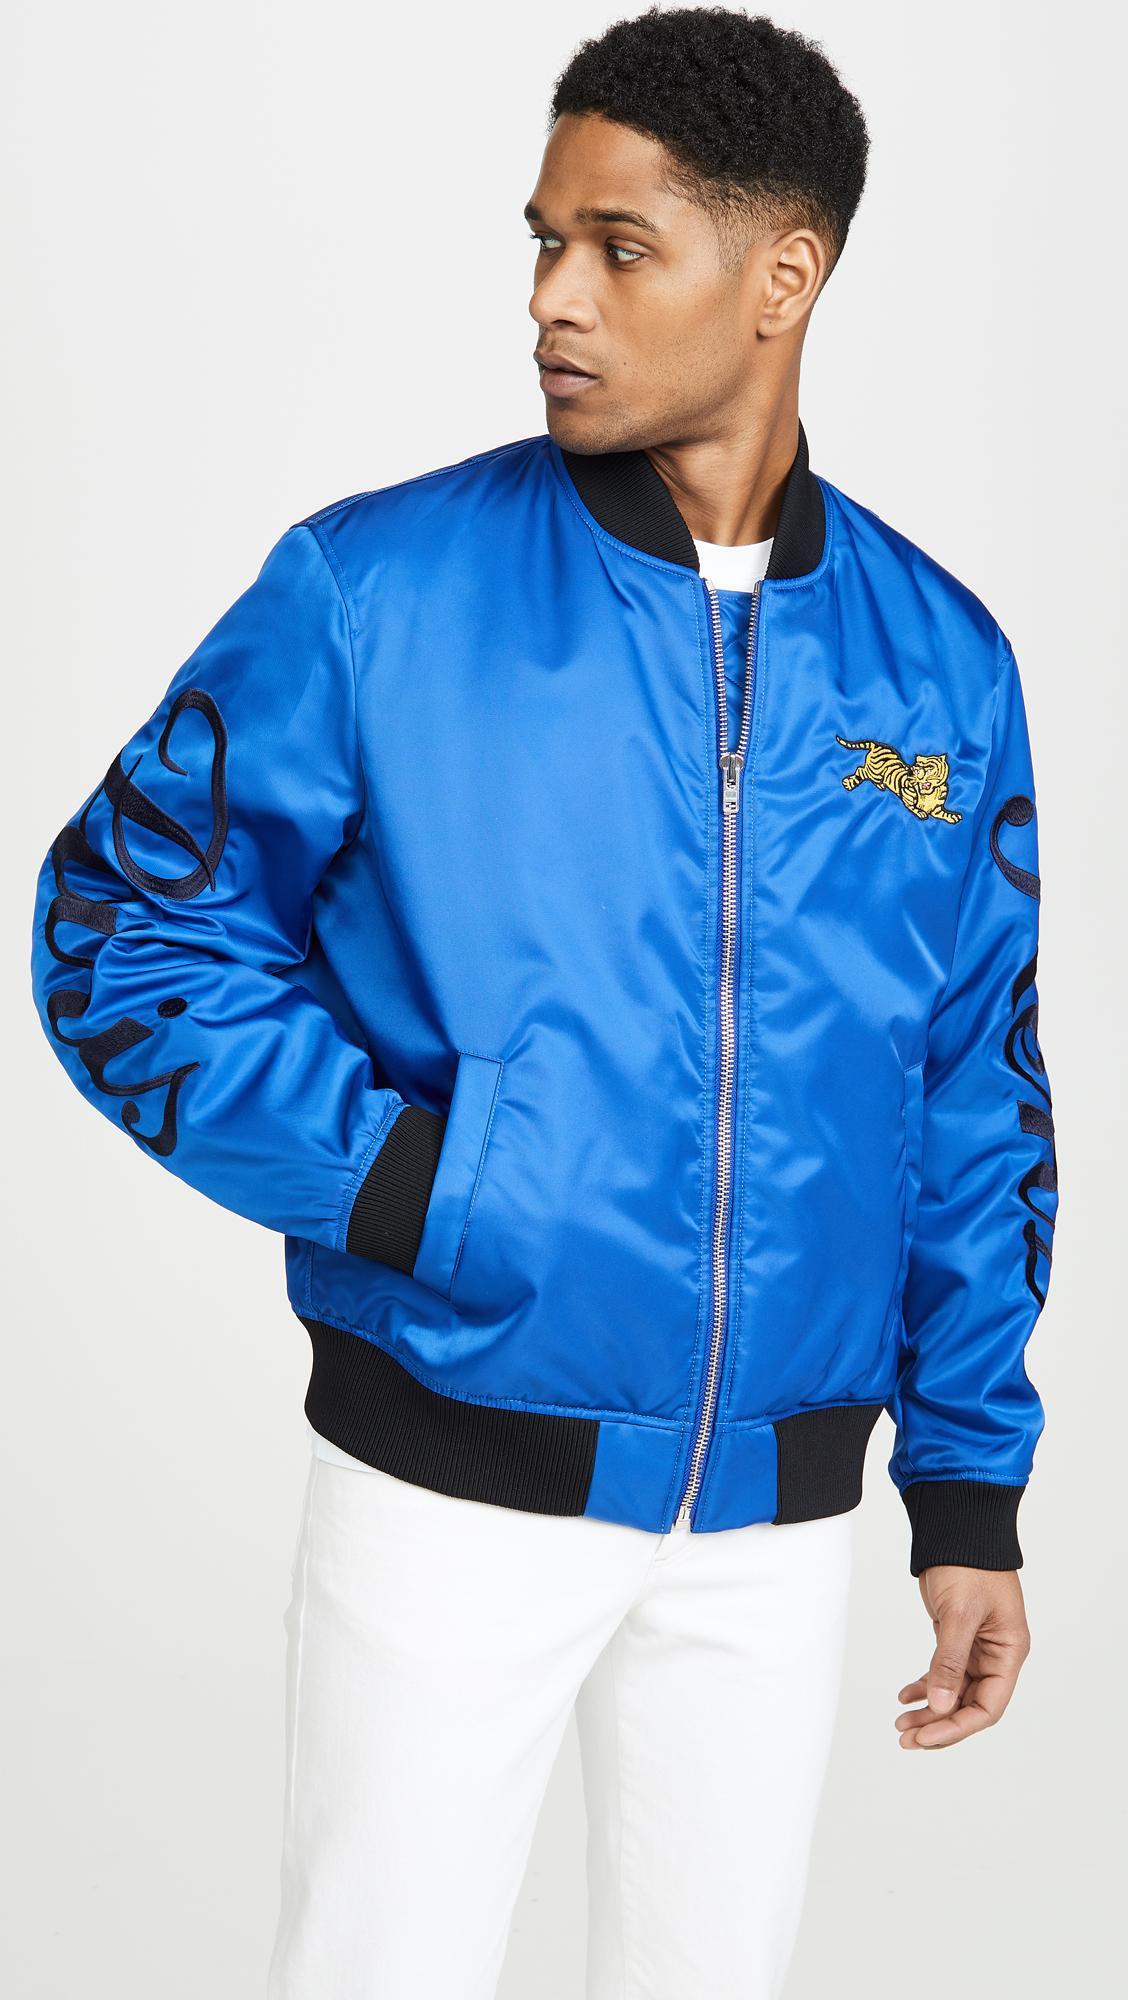 ec7323684f KENZO - Blue Jumping Tiger Crest Bomber Jacket for Men - Lyst. View  fullscreen